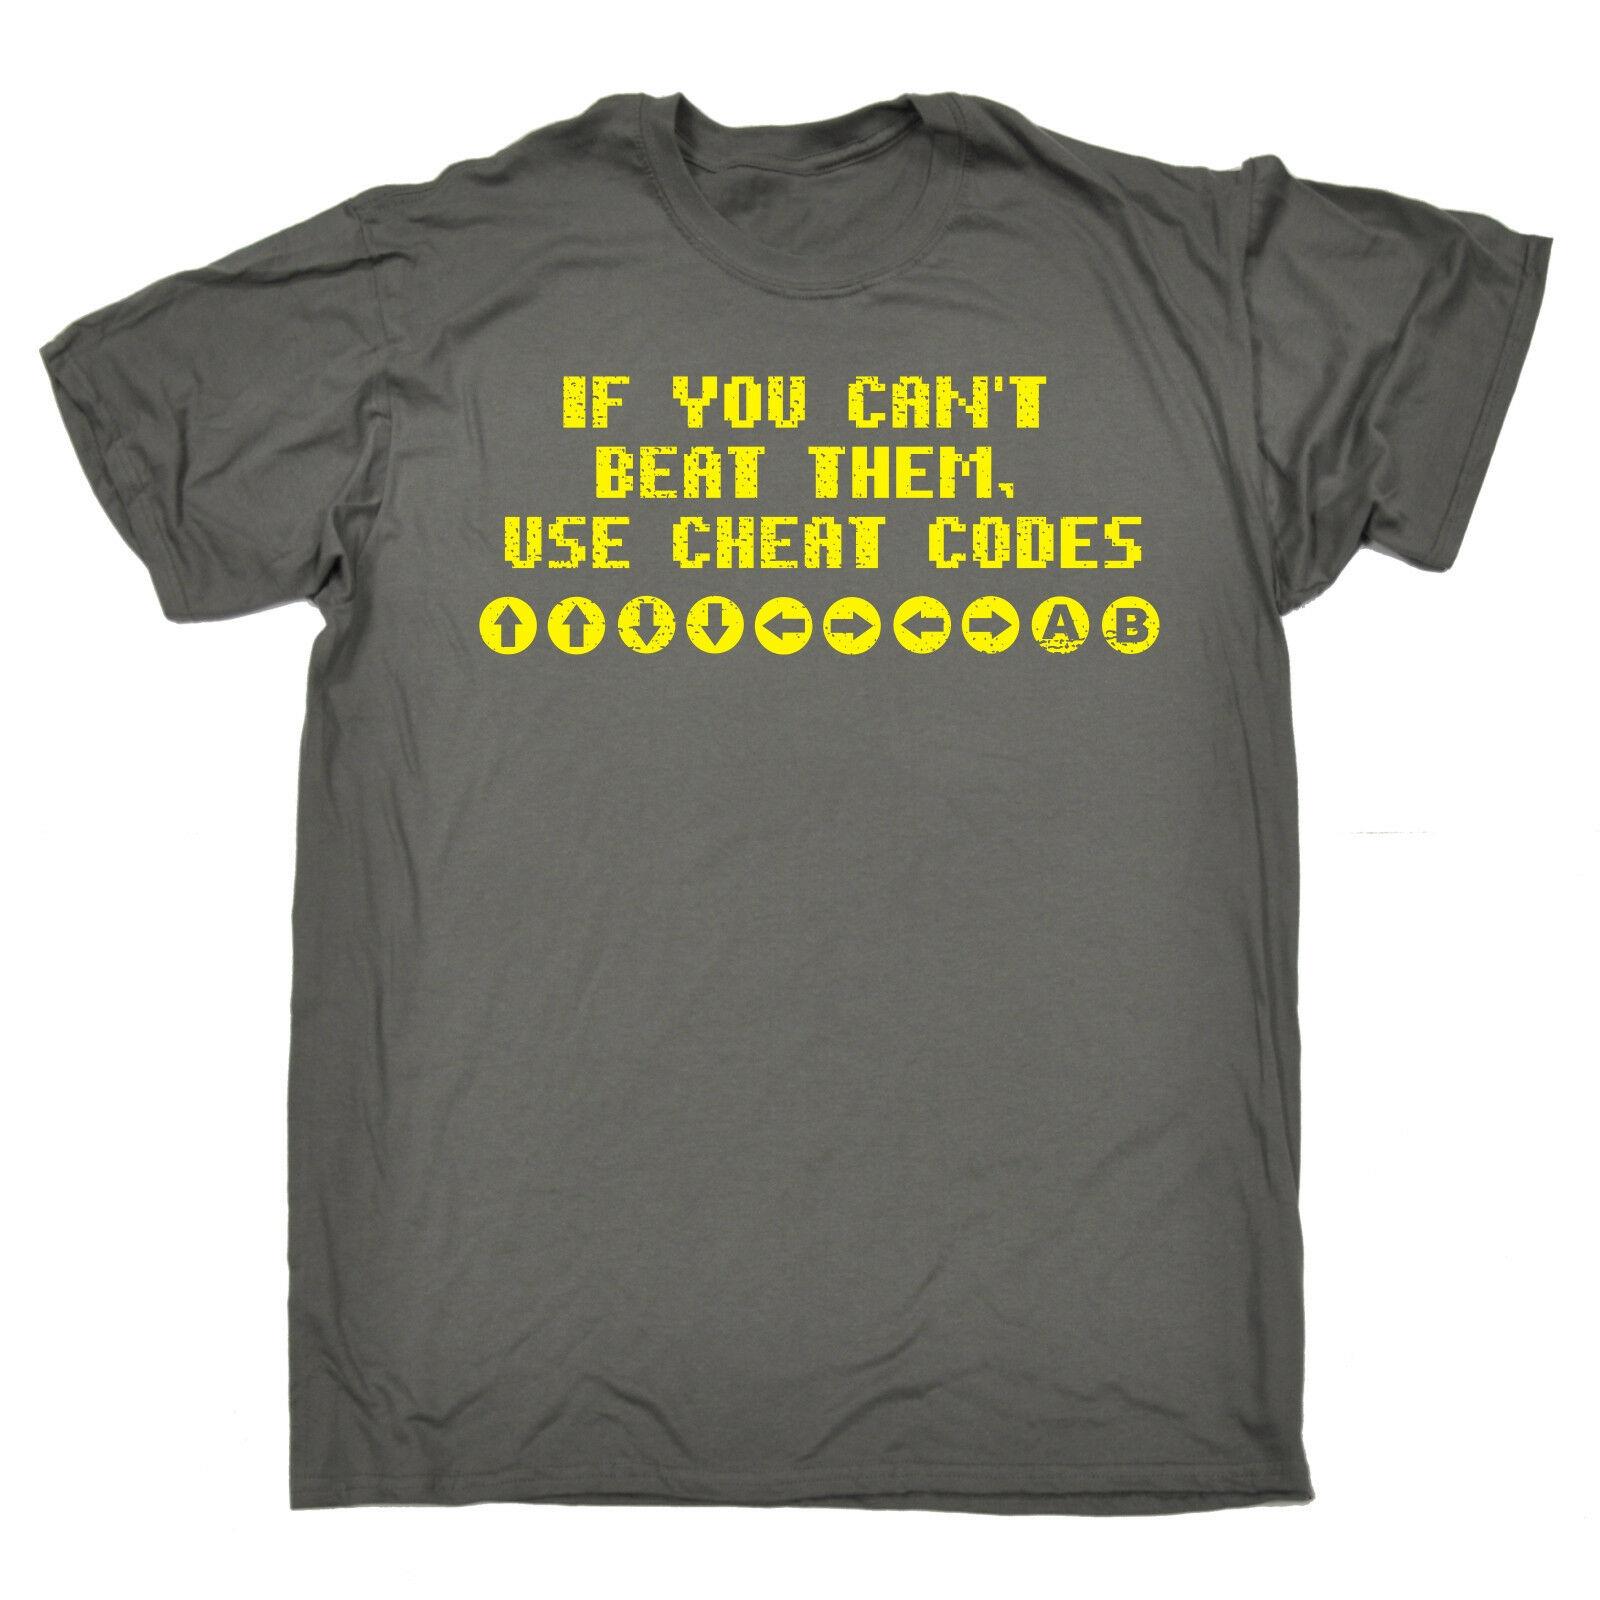 Camiseta para hombre If You can Beat Them Use Cheat Code, regalo de cumpleaños, videojuegos